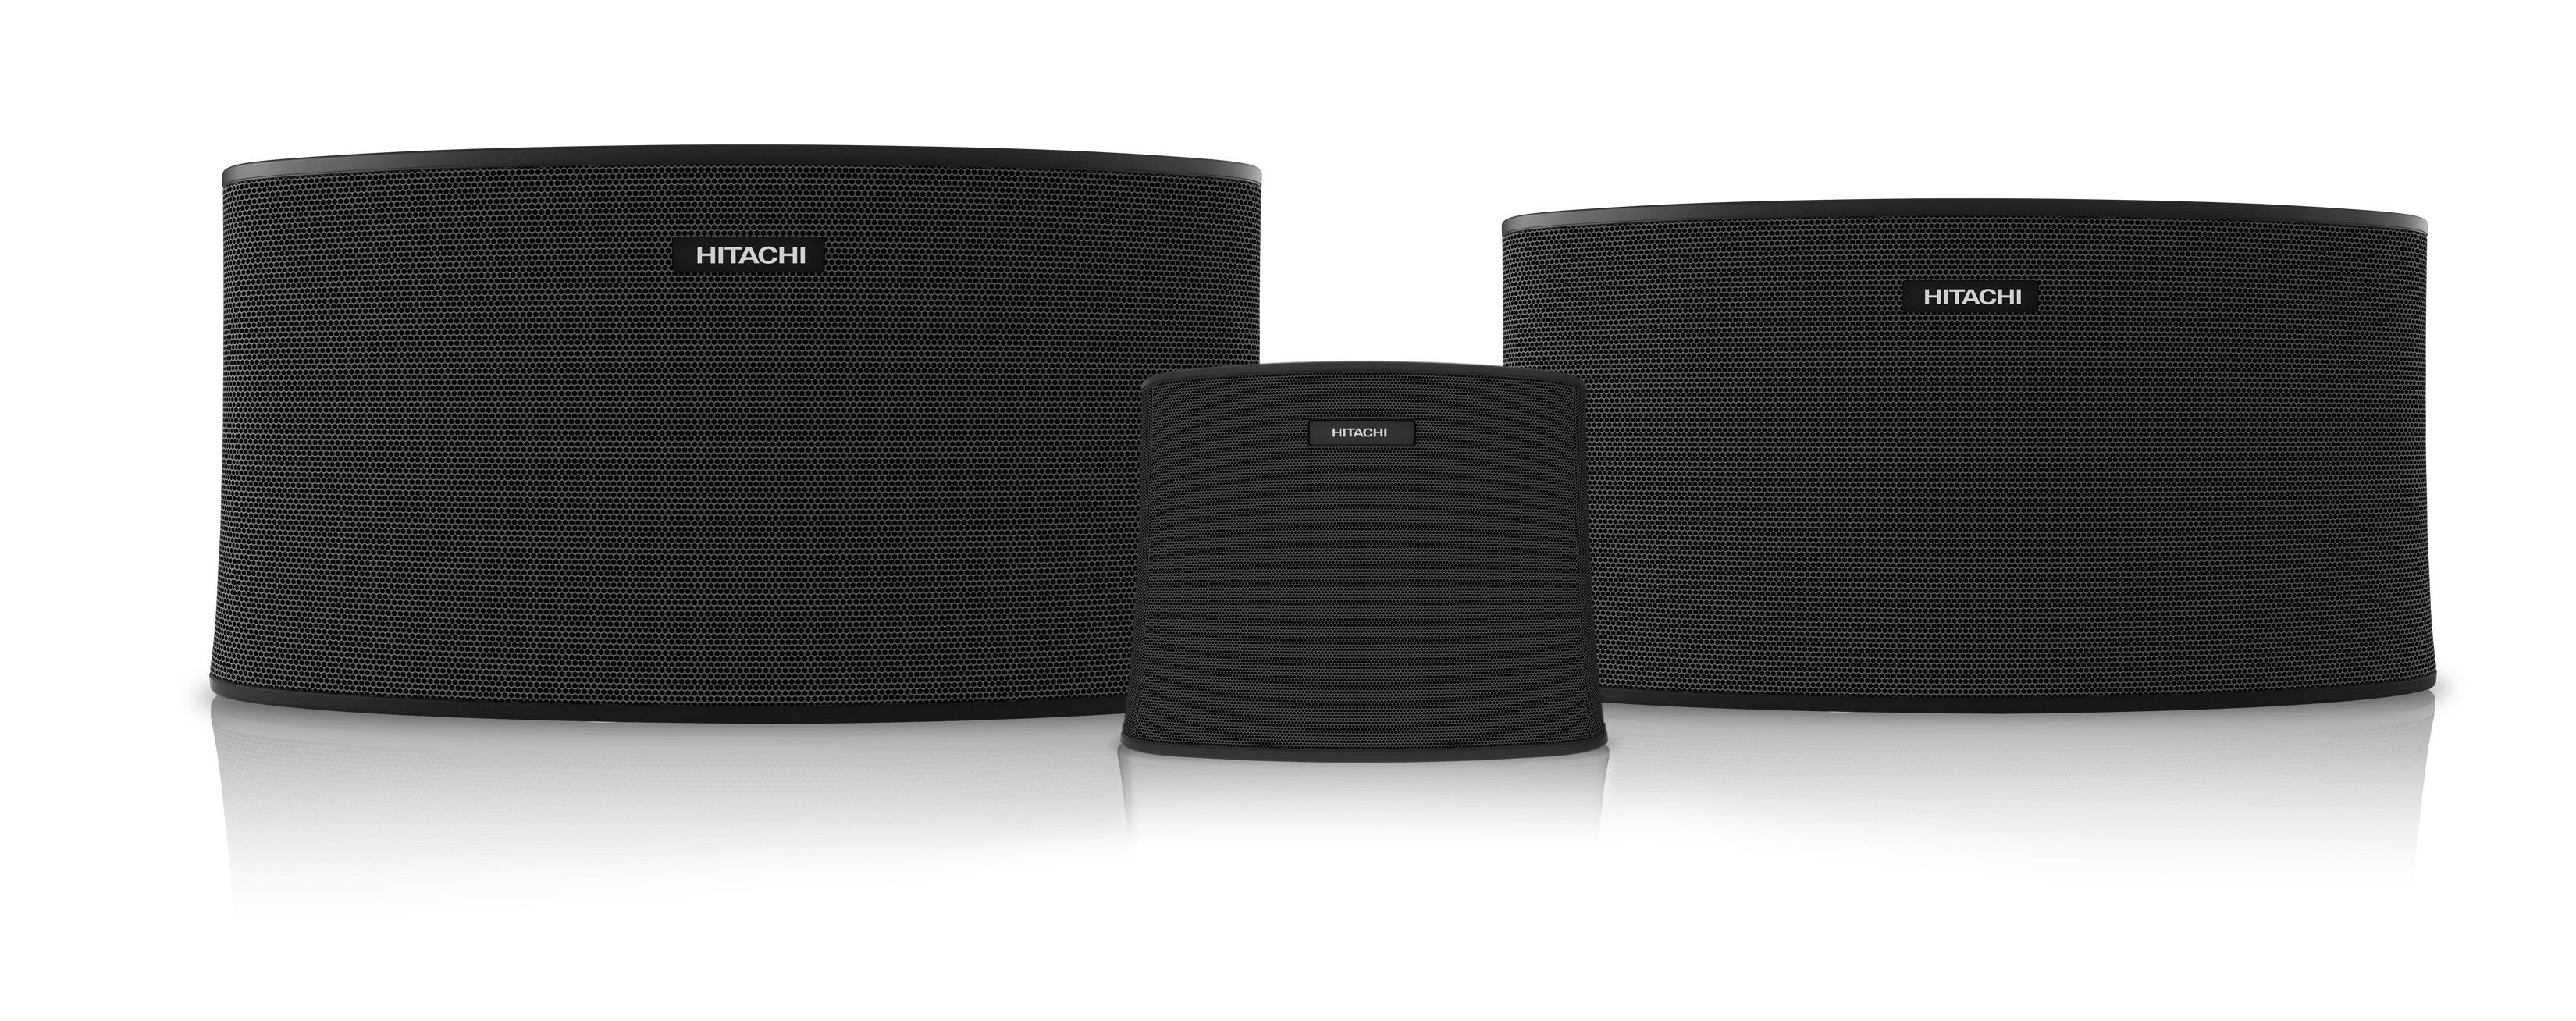 hitachi smart wifi speaker. hitachi introduces high-performance wireless whole-home audio speakers | business wire smart wifi speaker